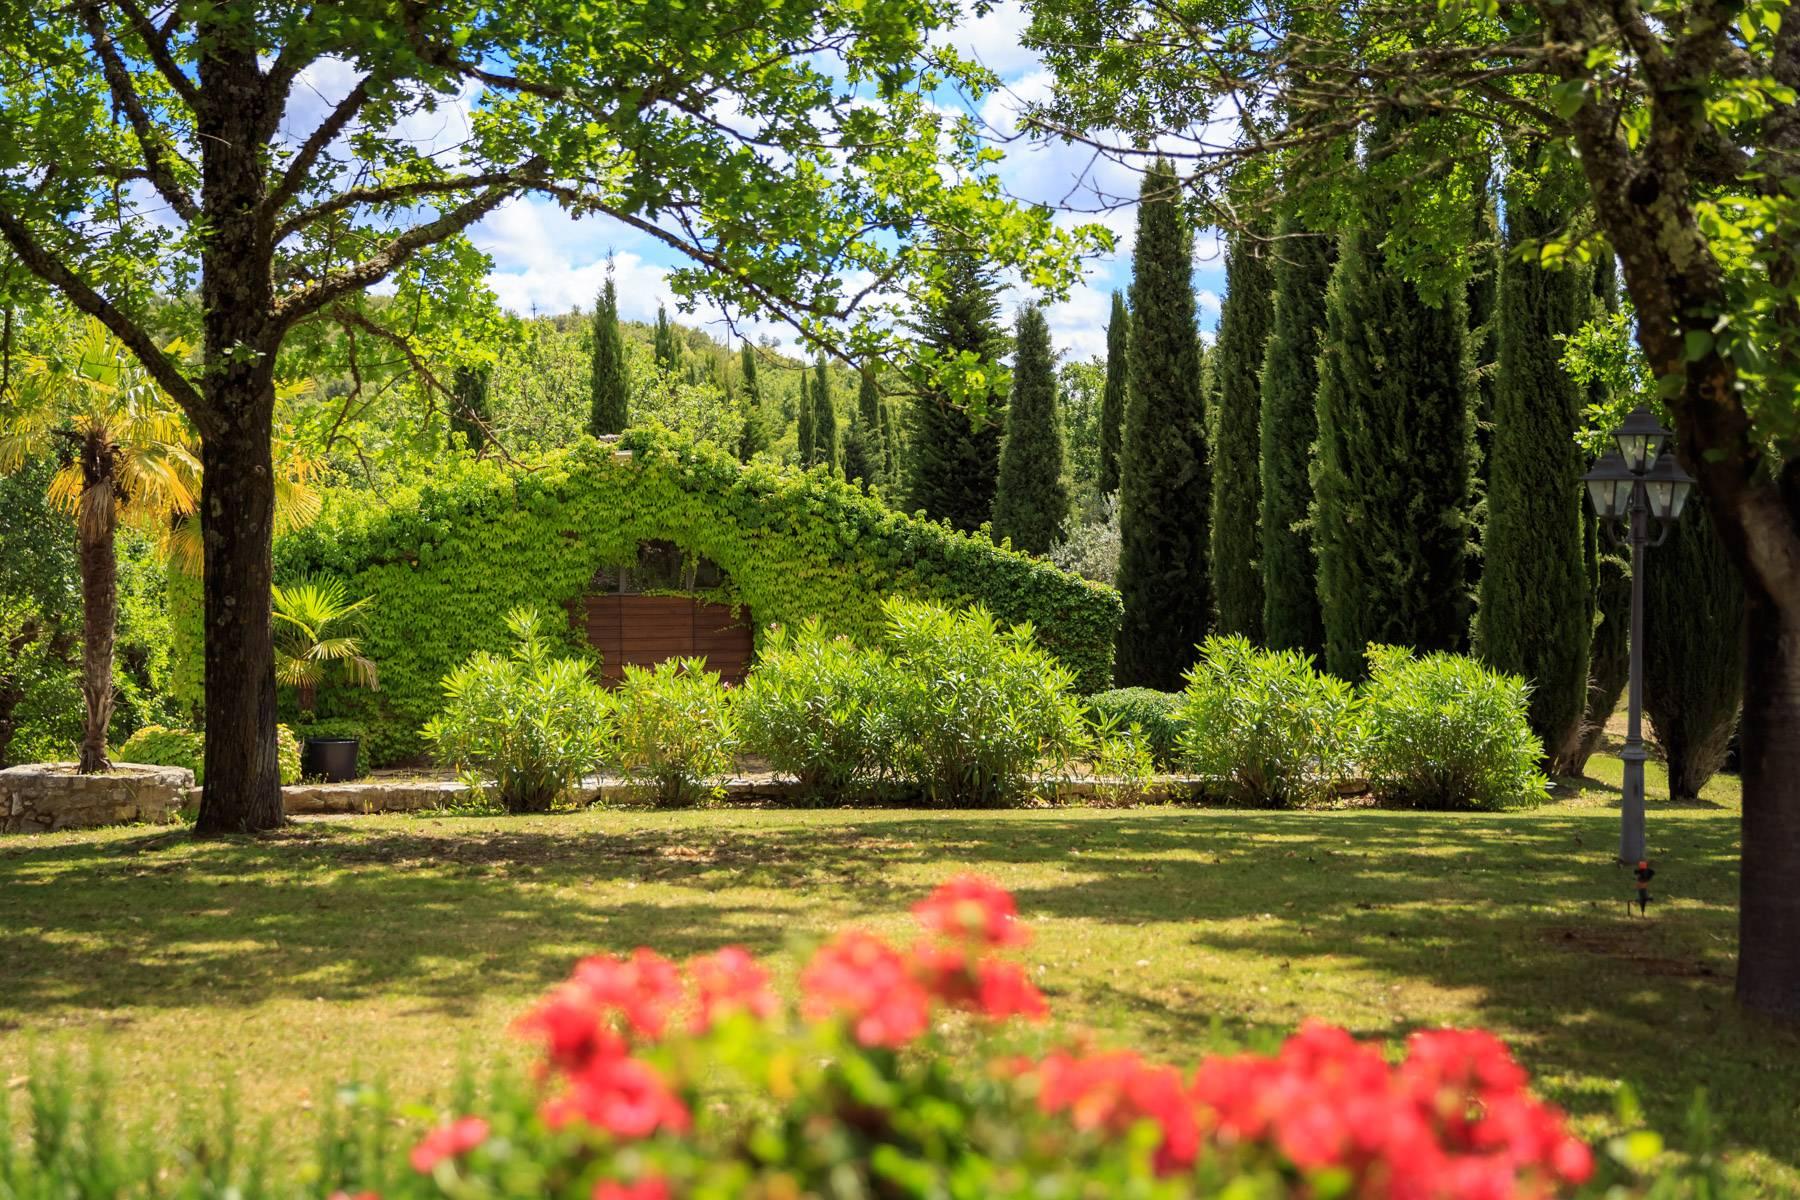 Villa in Vendita a Gaiole In Chianti: 5 locali, 465 mq - Foto 17